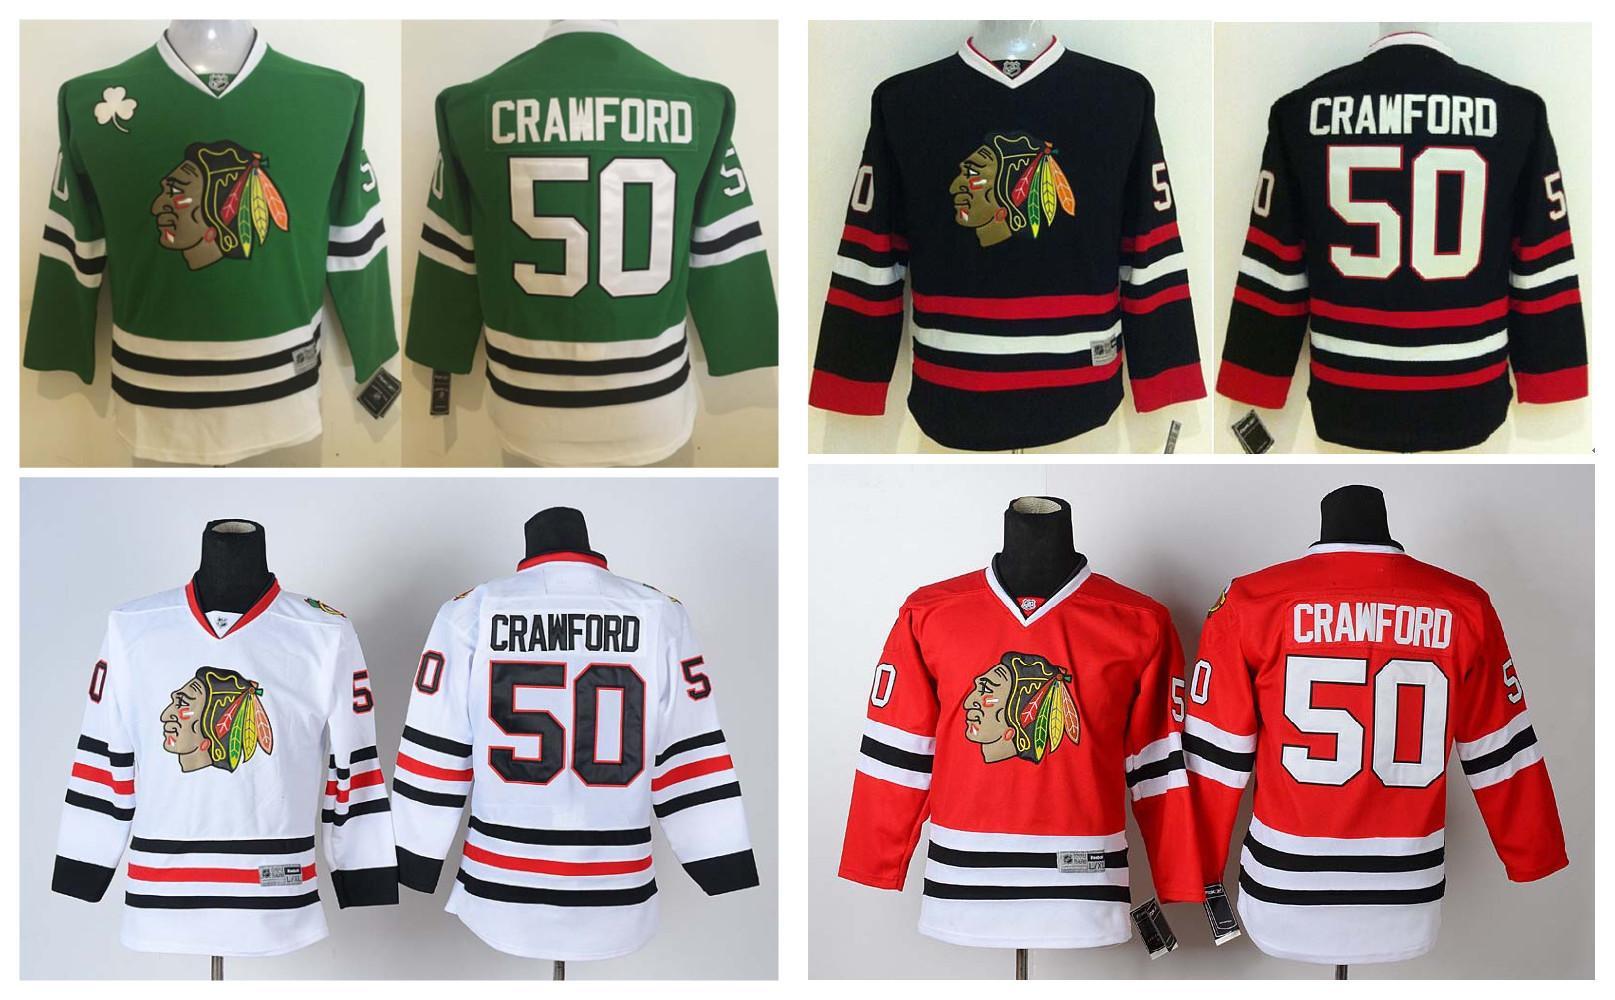 ... 2016 Youth Kids Chicago Blackhawks Ice Hockey Jerseys Cheap 50 Corey  Crawford Boys Jerseys Authentic Stitched ... dc5b99721